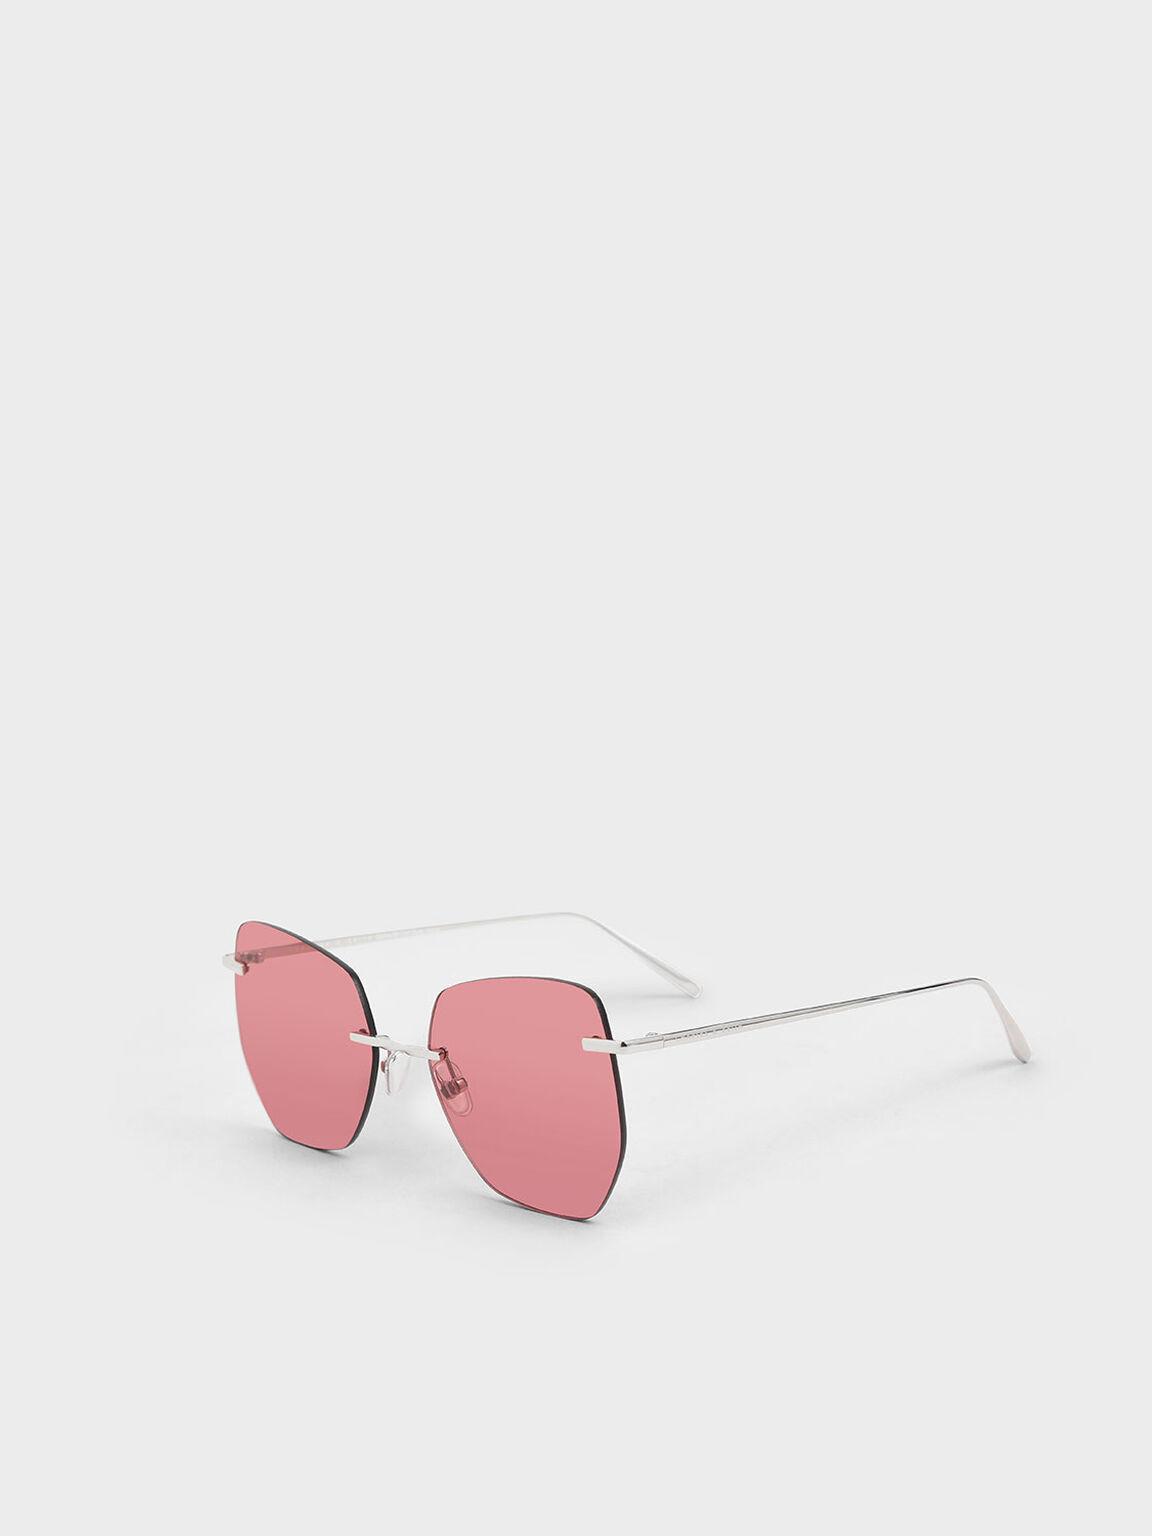 Rimless Geometric Sunglasses, Red, hi-res